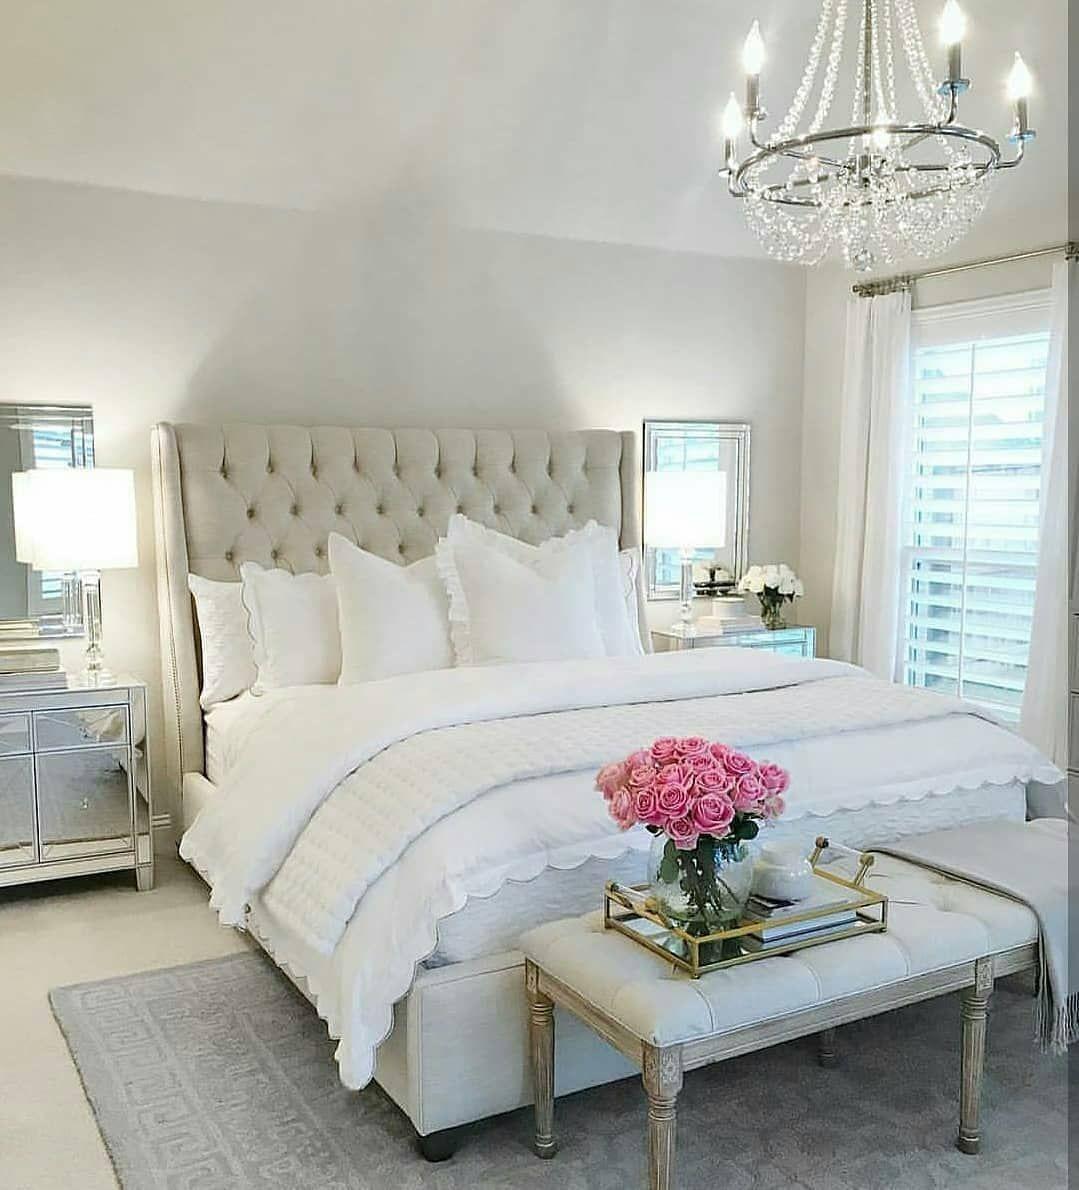 New The 10 Best Home Decor With Pictures کدومشو میپسندید پست های قبلی رو هم ببینید Decor Idea Master Bedrooms Decor Bedroom Interior Home Decor Bedroom